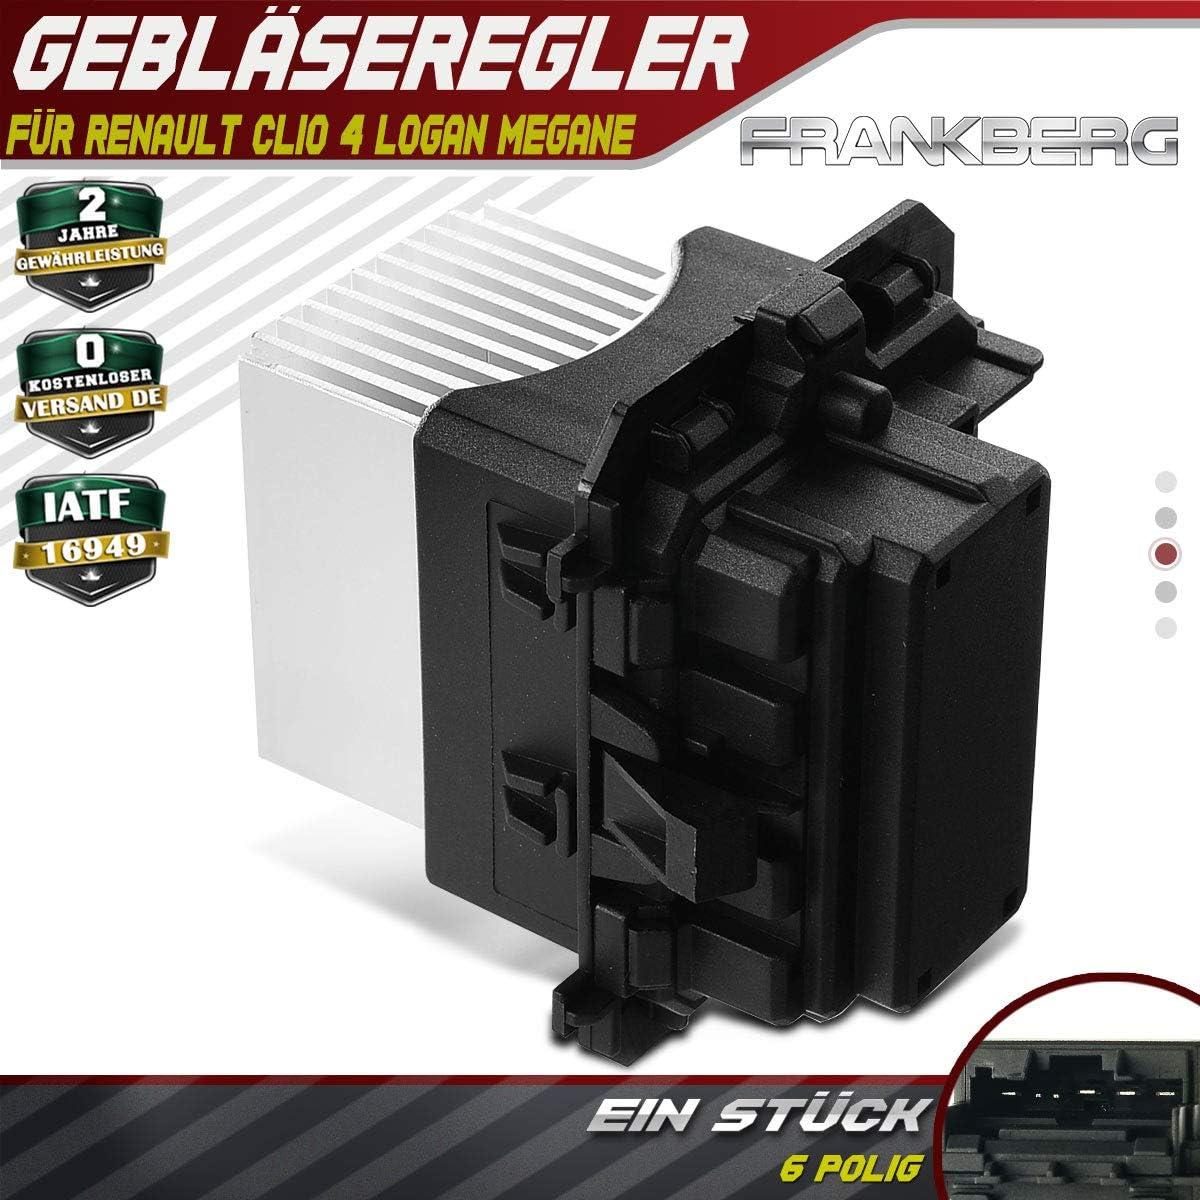 Regulador de ventilador Motor de ventilador de resistencia frontal para C4 DS4 308 Clio IV Logan Megane Trafic Twingo 2001-2020 509961